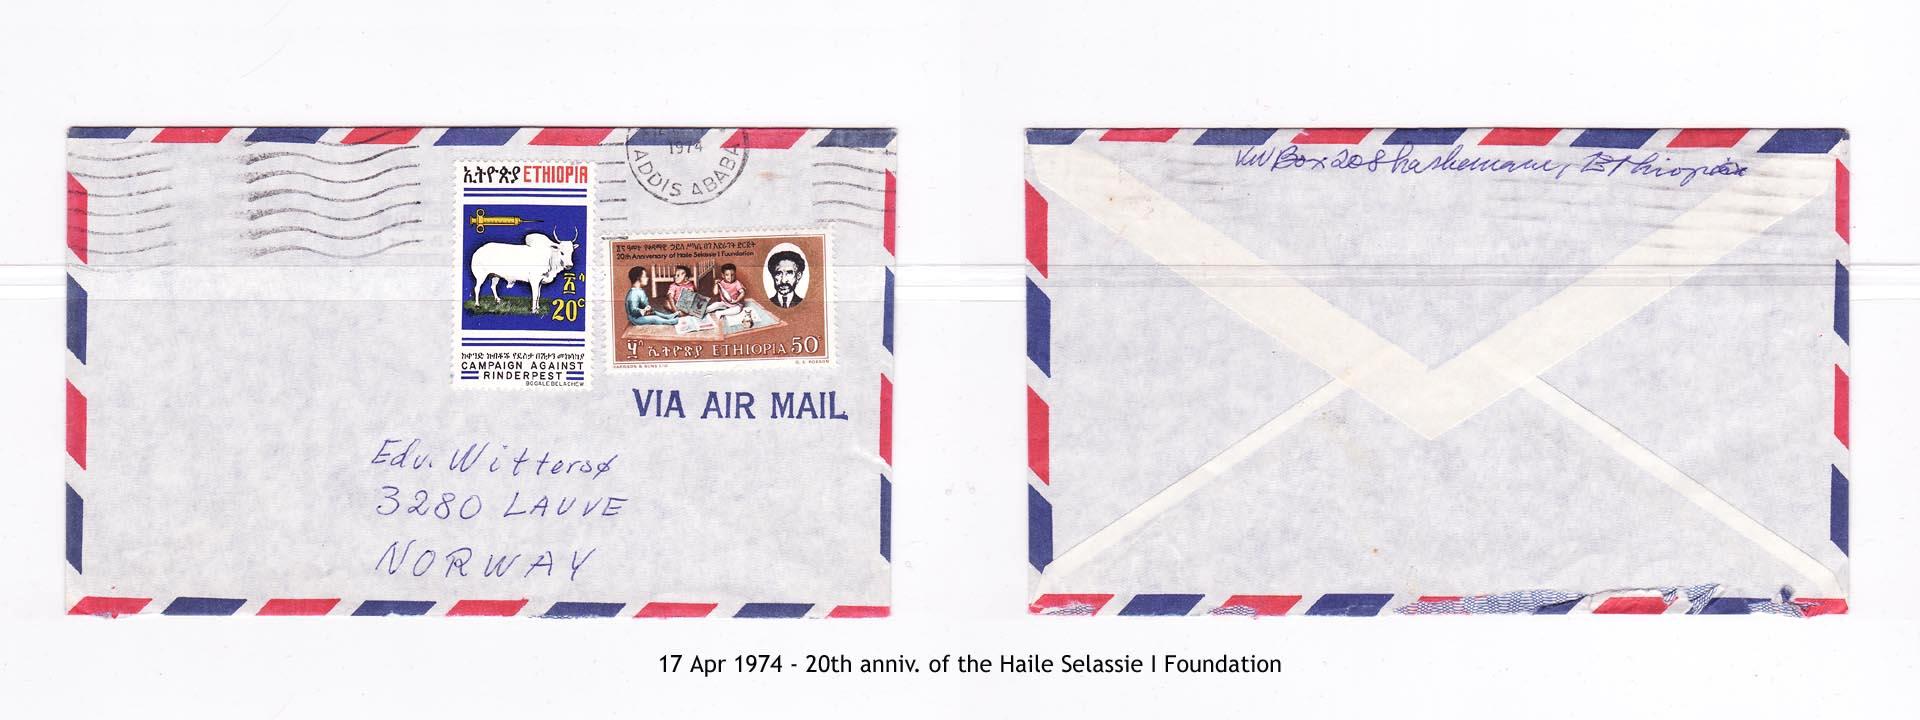 19740417 - 20th anniv. of the Haile Selassie I Foundation